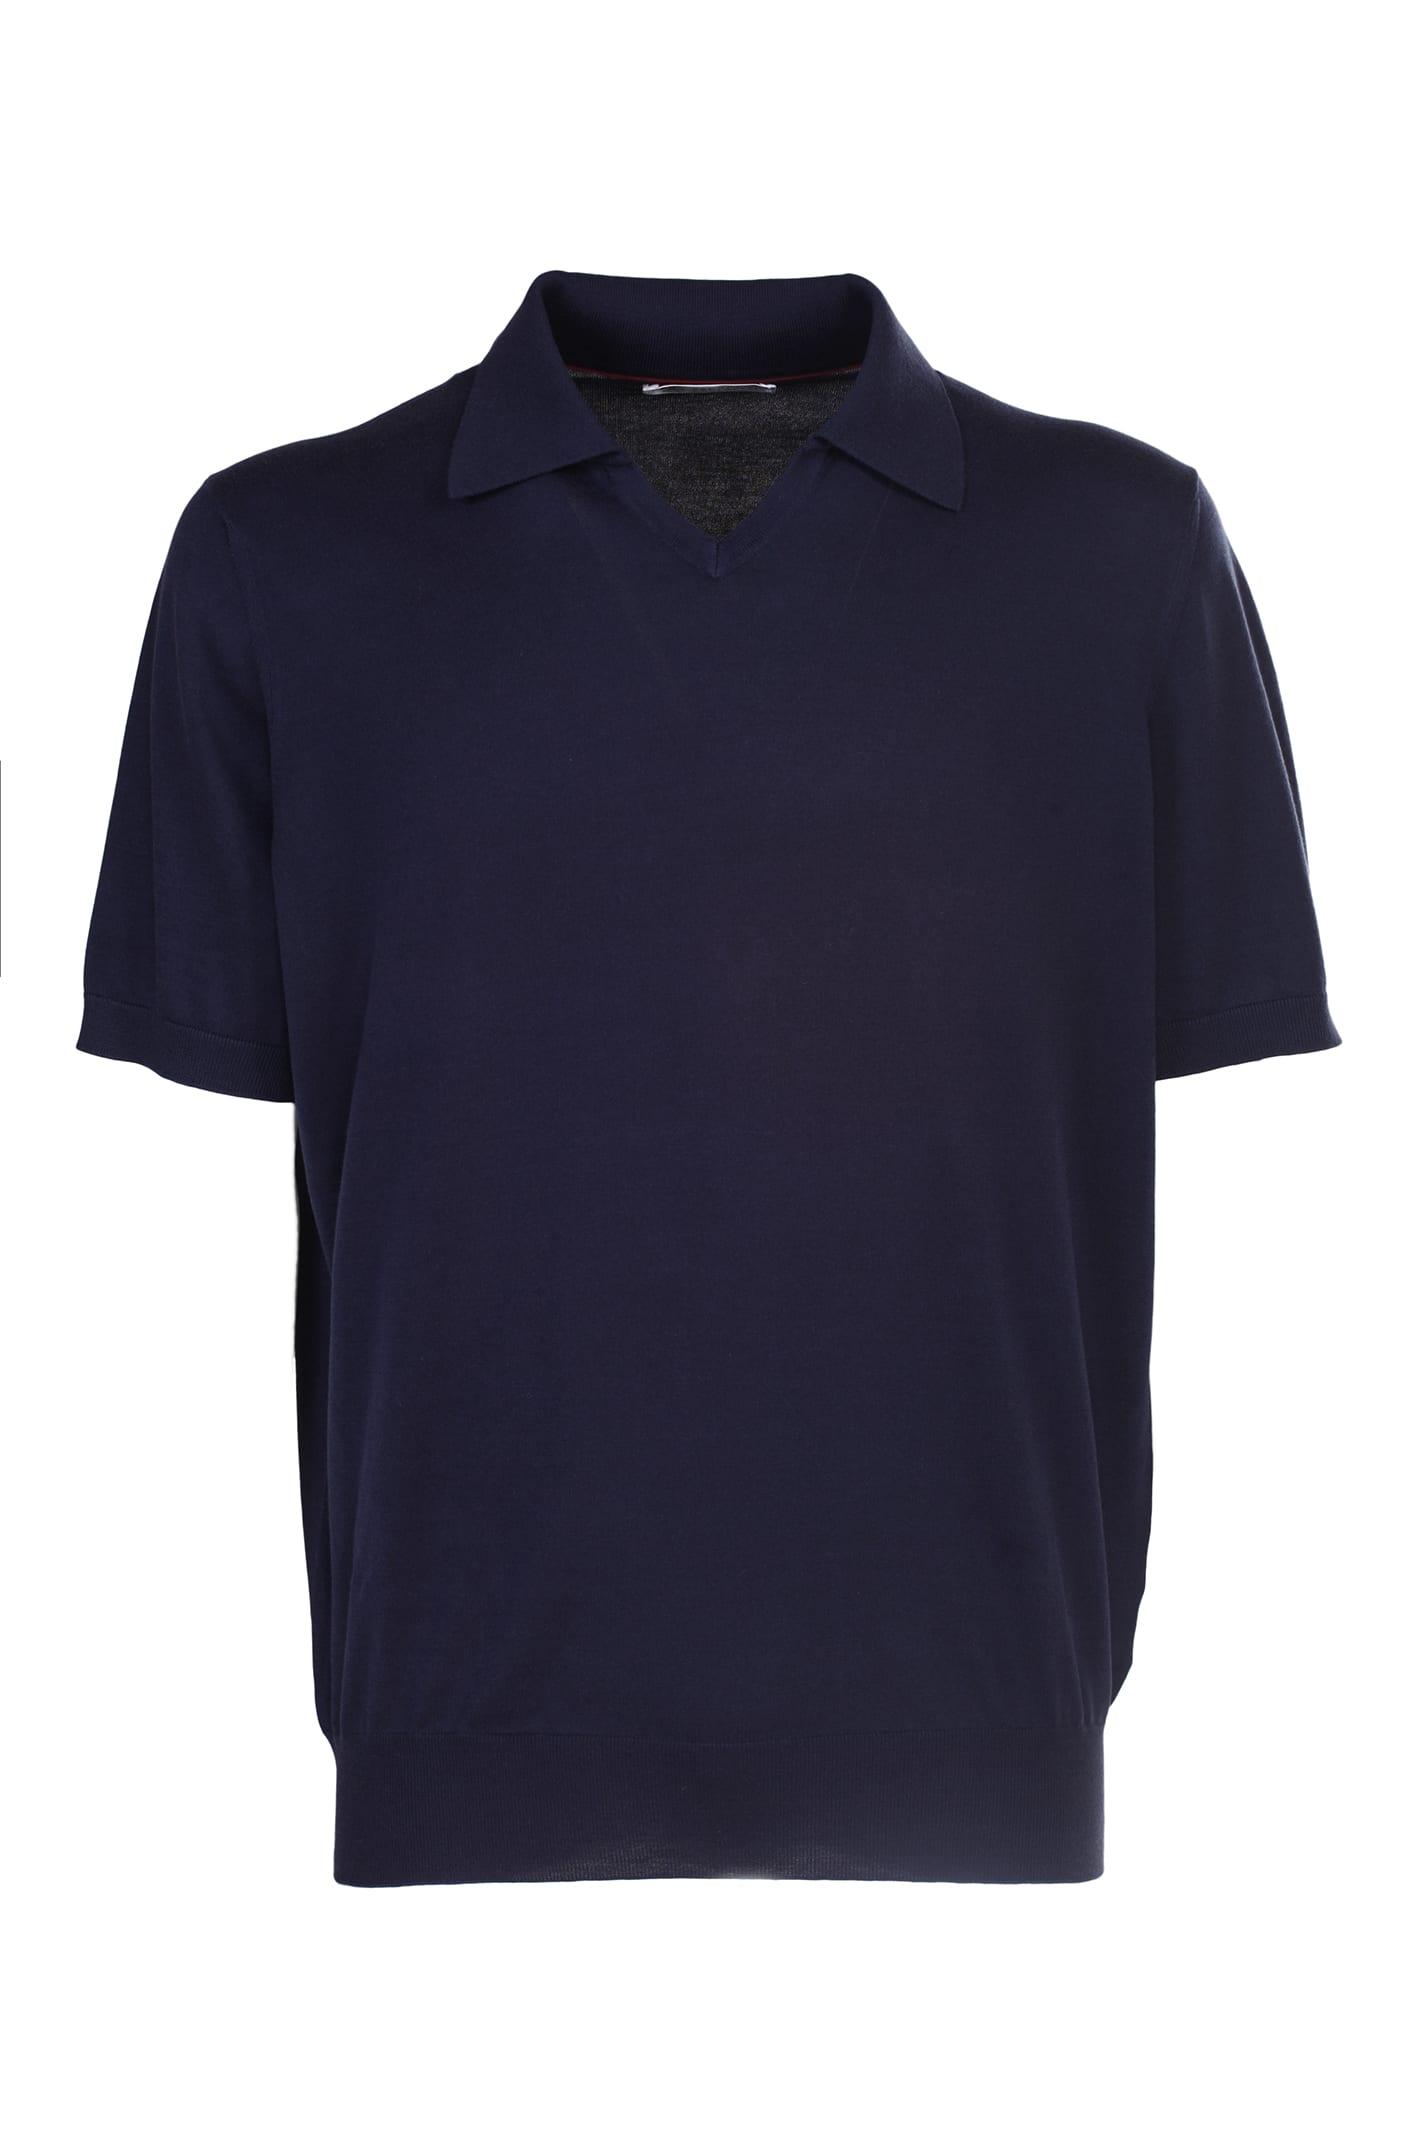 Blue Polo Shirt,